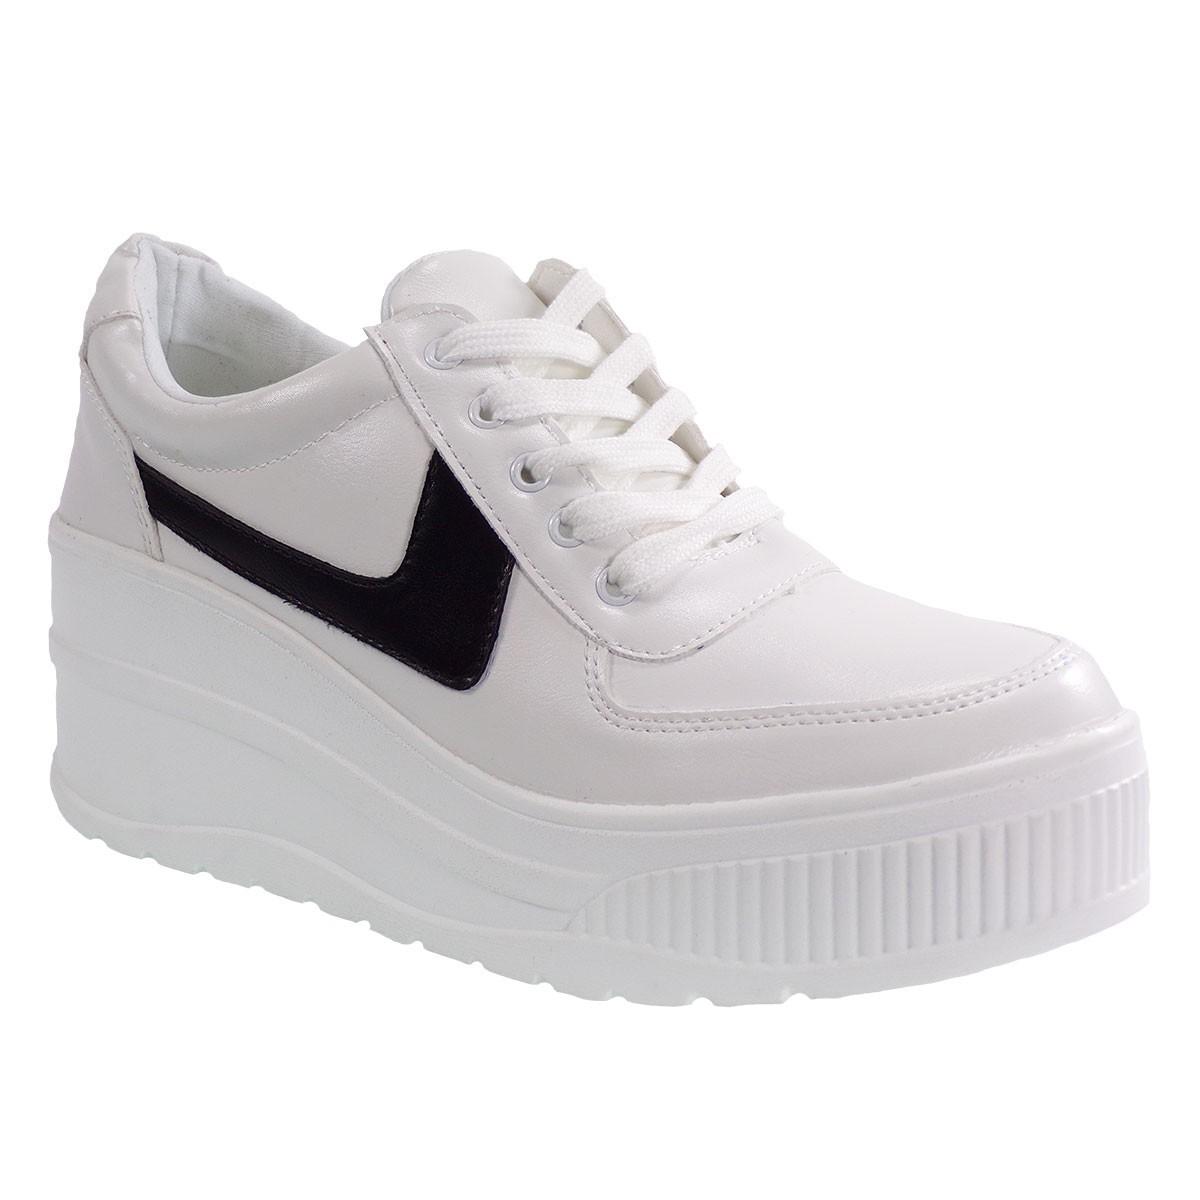 Bagiota Shoes Γυναικεία Παπούτσια Sneakers Αθλητικά H89002-2 Λευκό